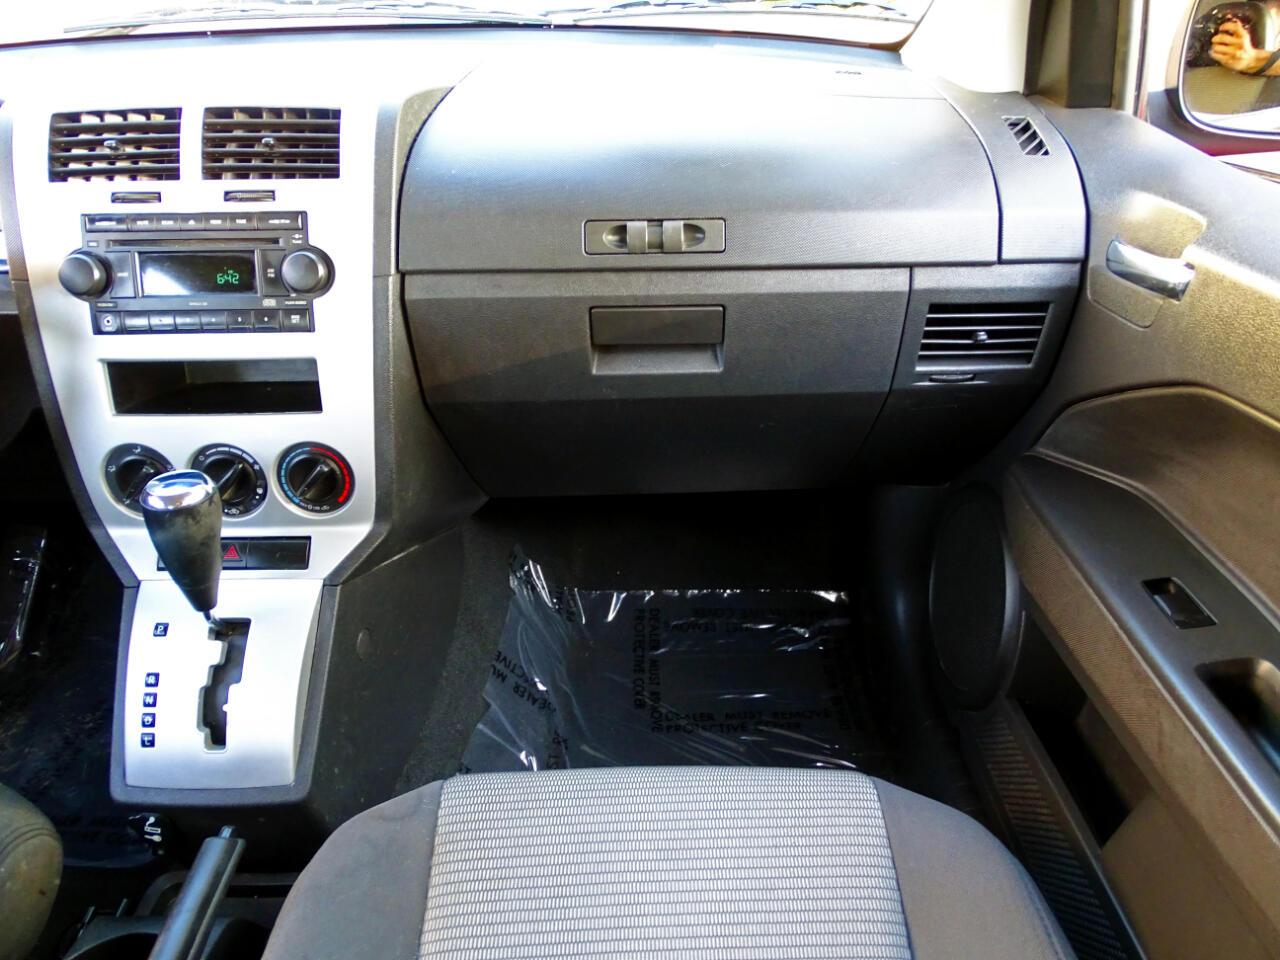 2008 Dodge Caliber 4dr HB SXT FWD